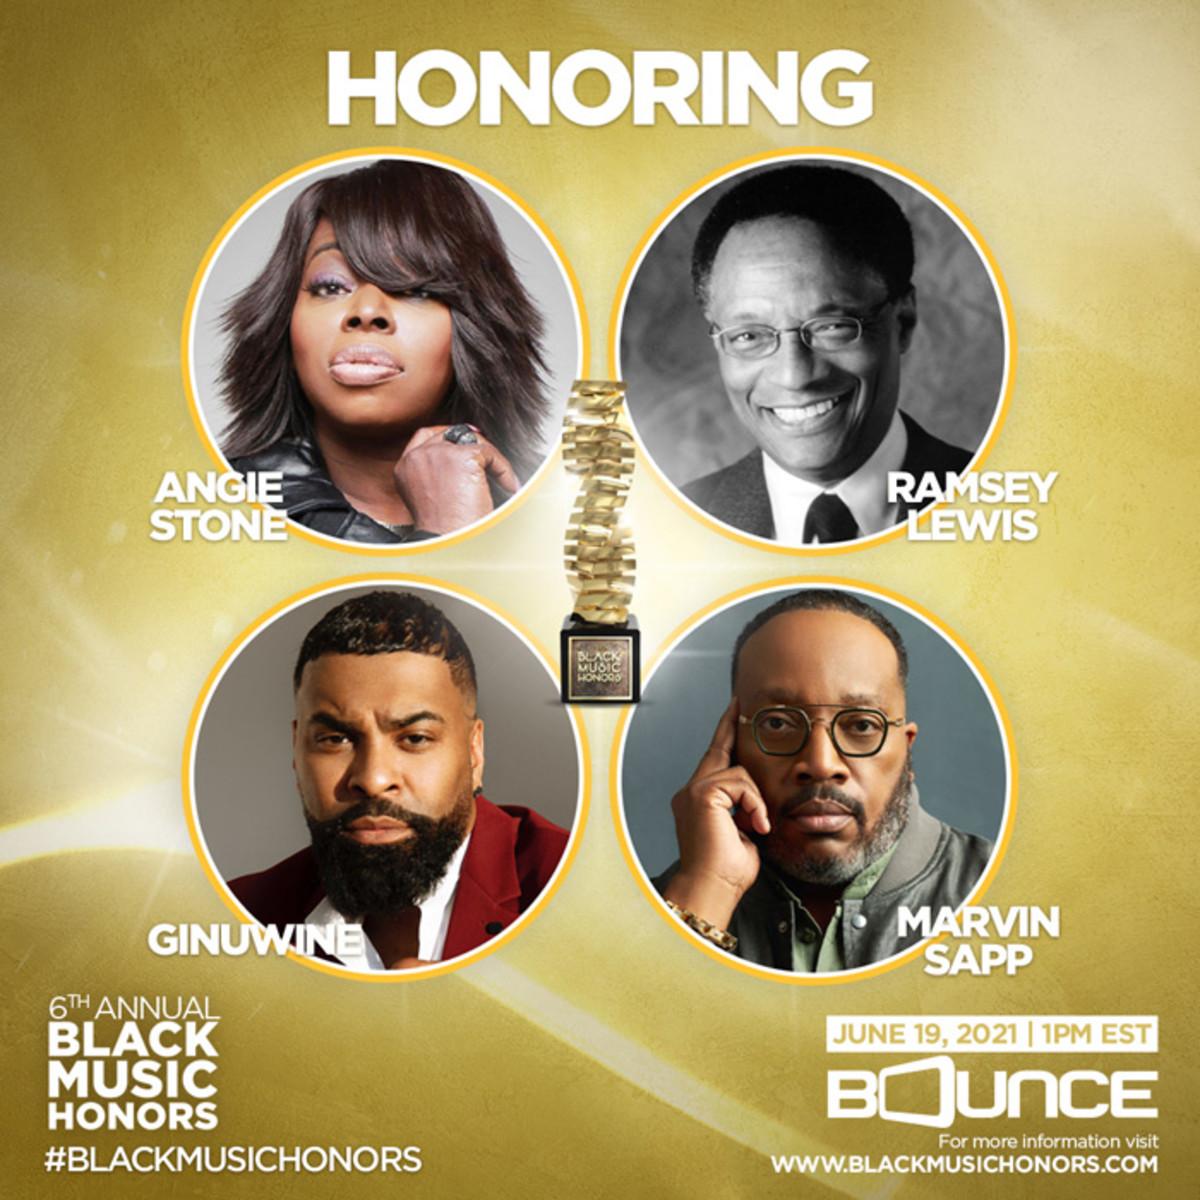 6th Annual Black Music Honors award recipients